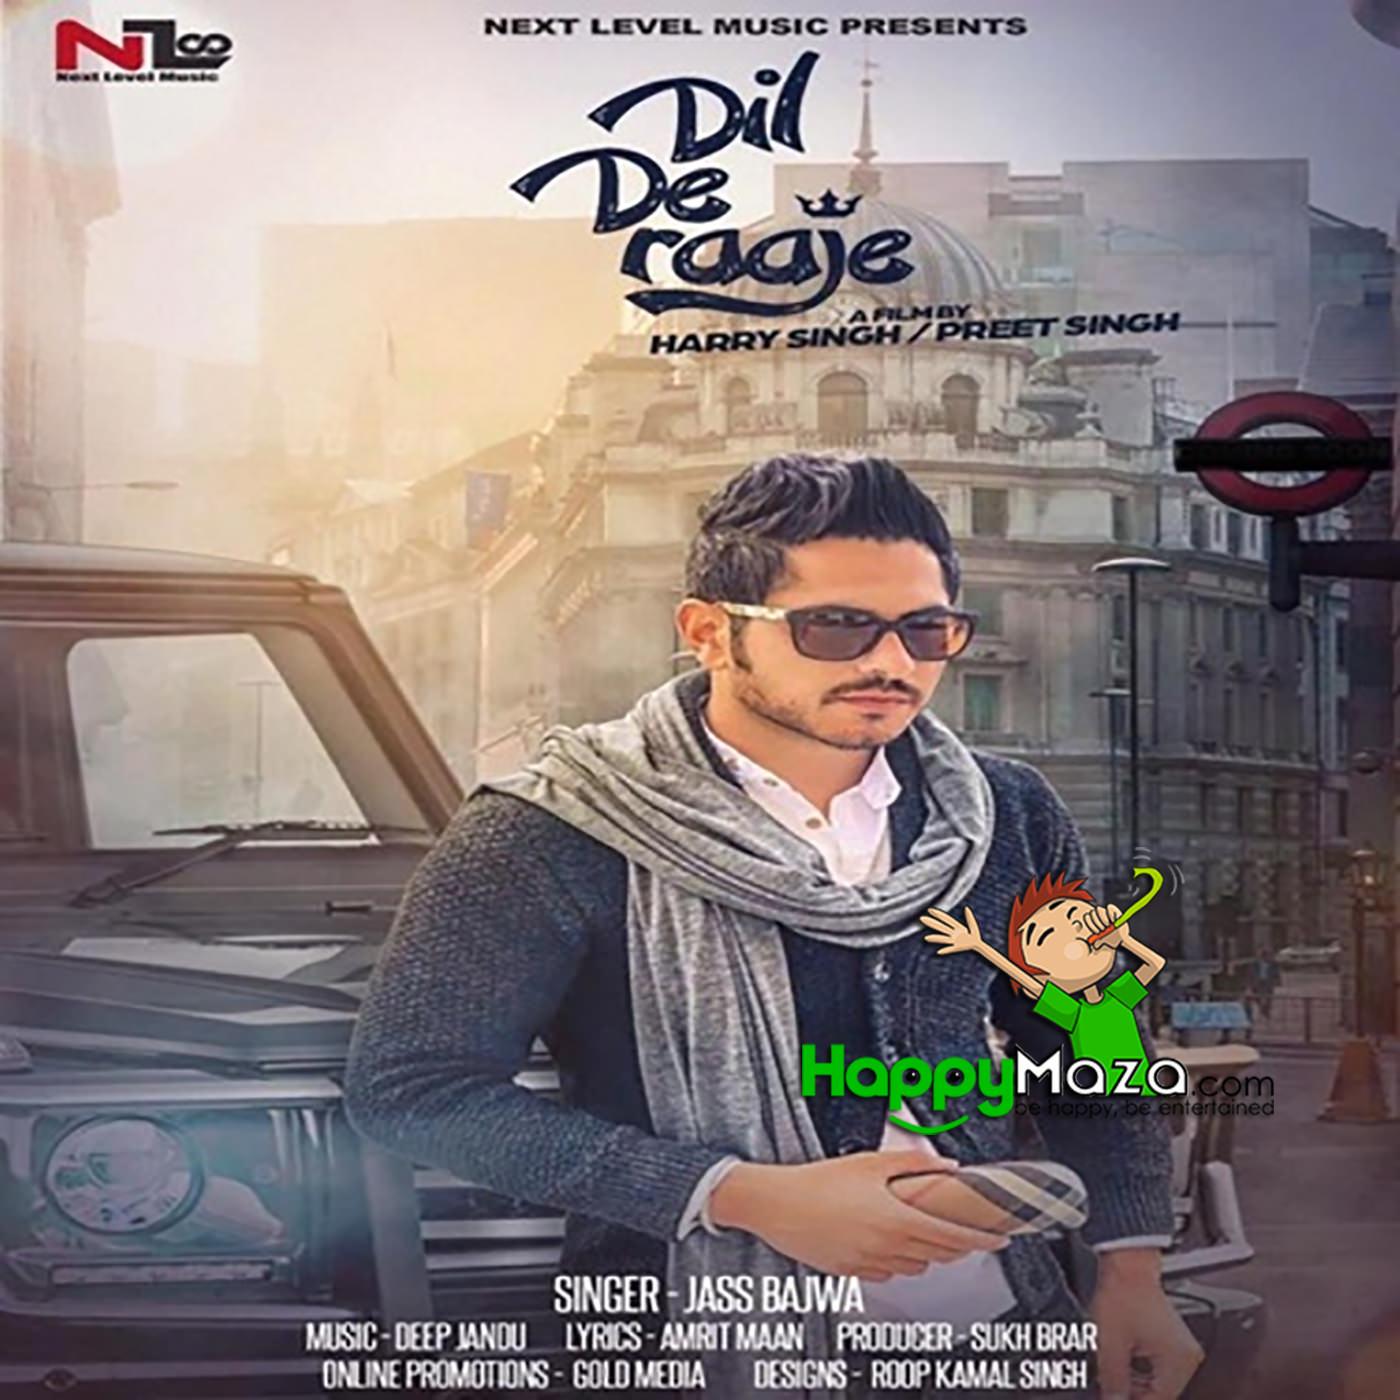 Tere Yaar Bathere Ne Song Mp3: Dil De Raaje Lyrics - Jass Bajwa - 2017